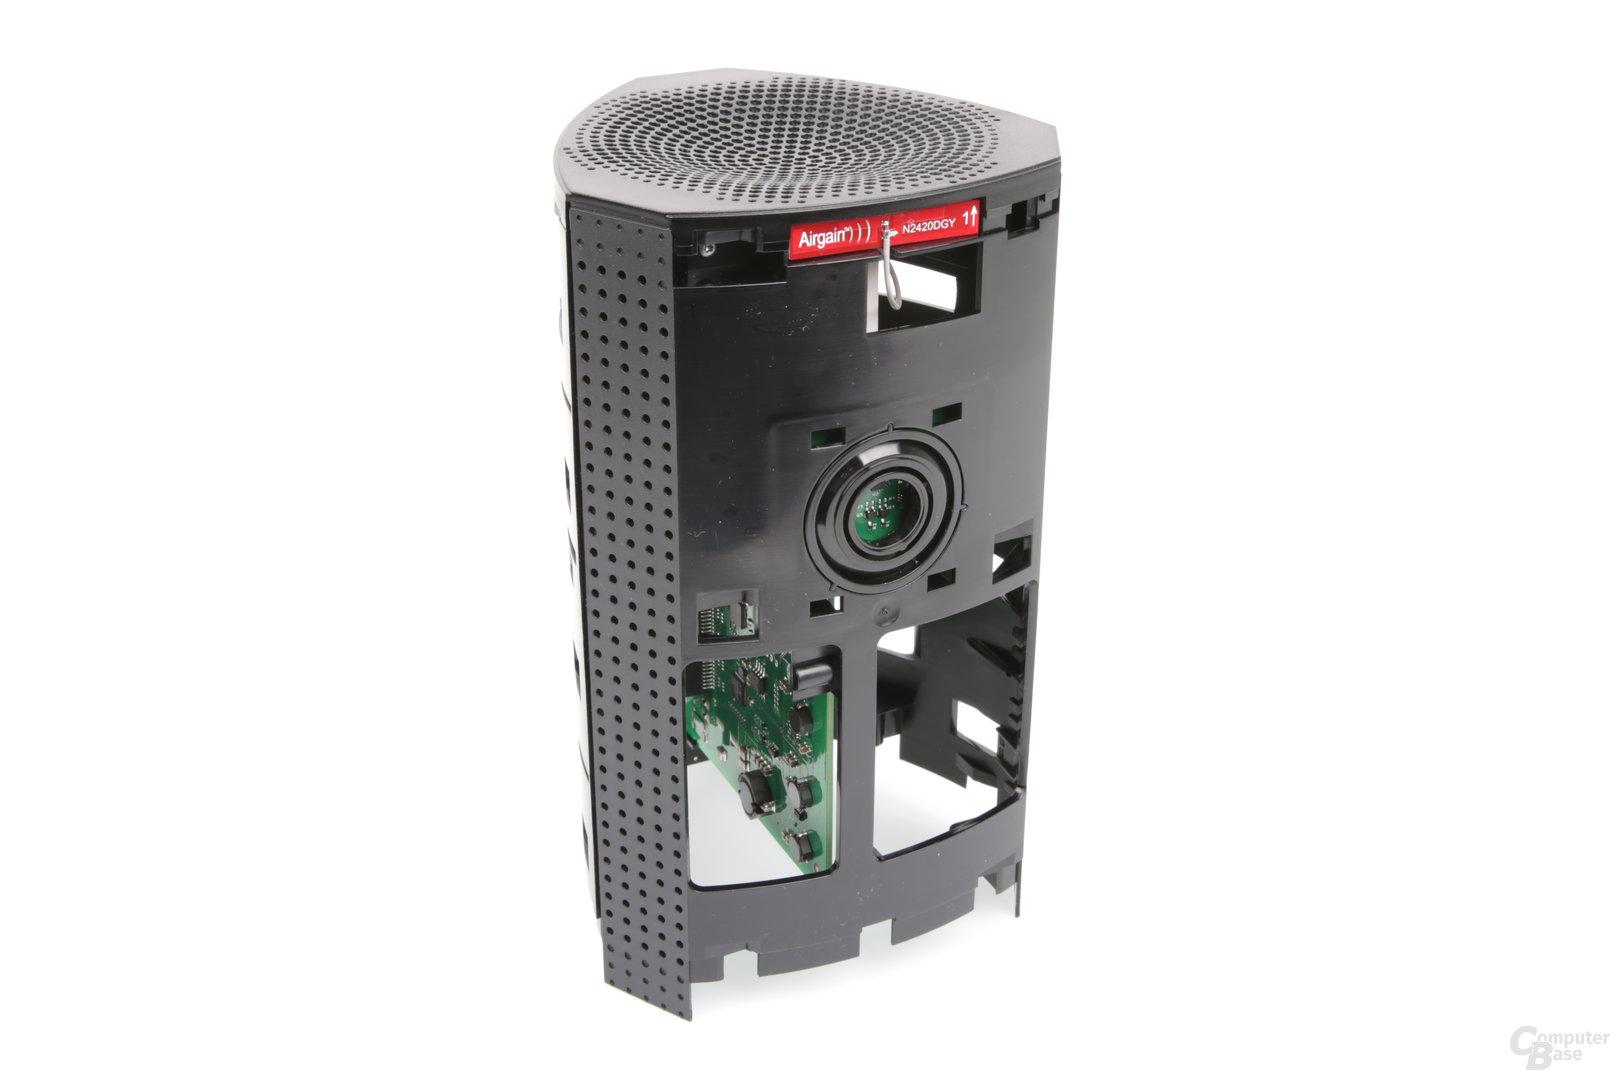 Bitdefender Box – LED-Ring und WLAN-Antennen